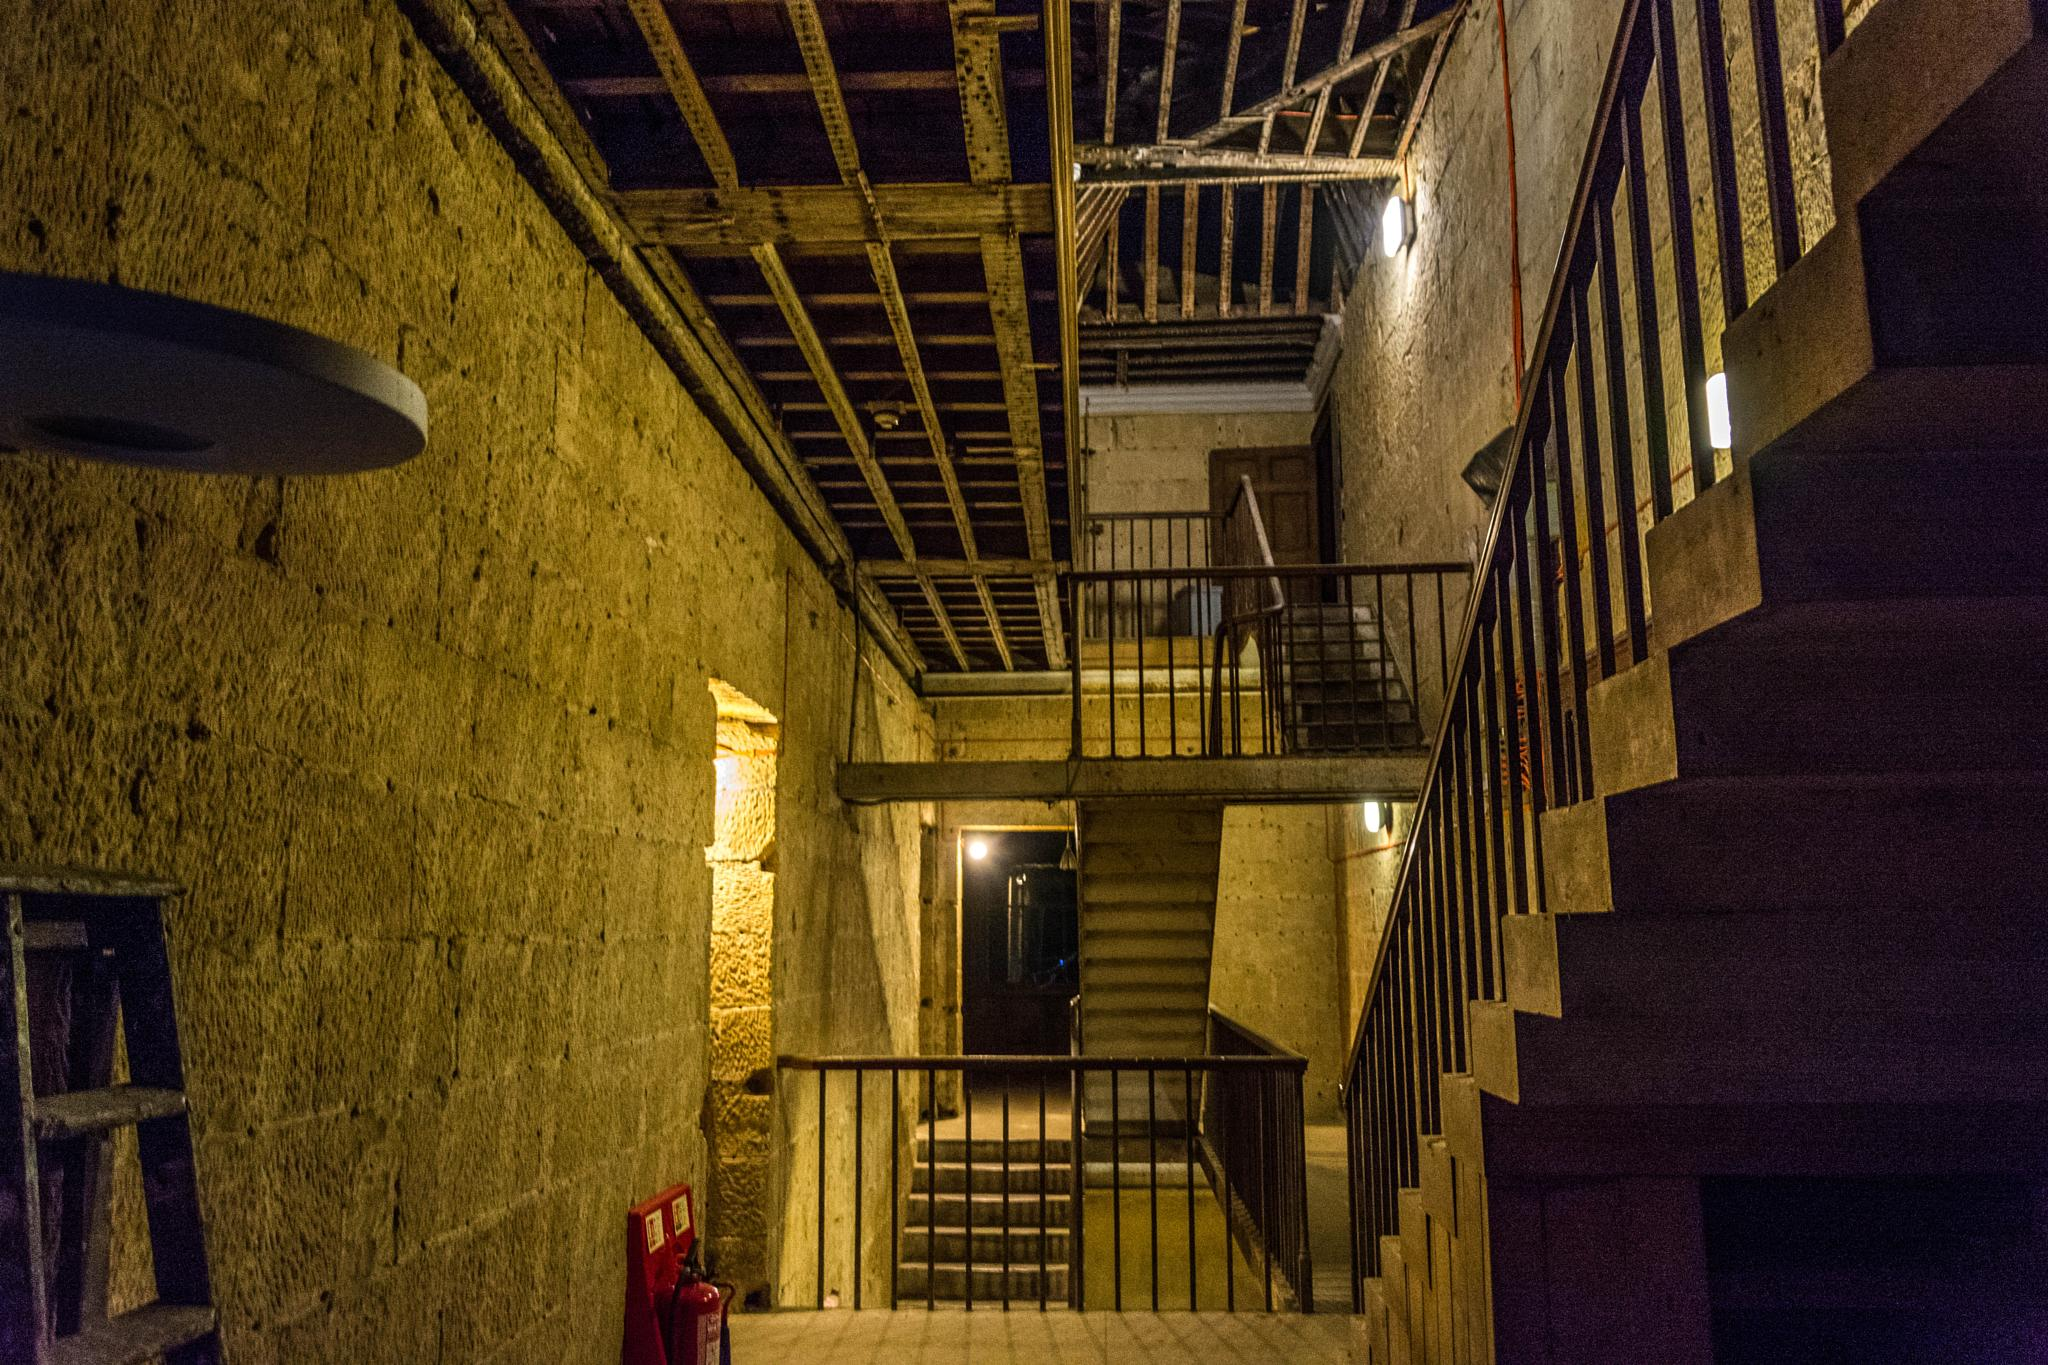 More Stairs by Robert Nixon